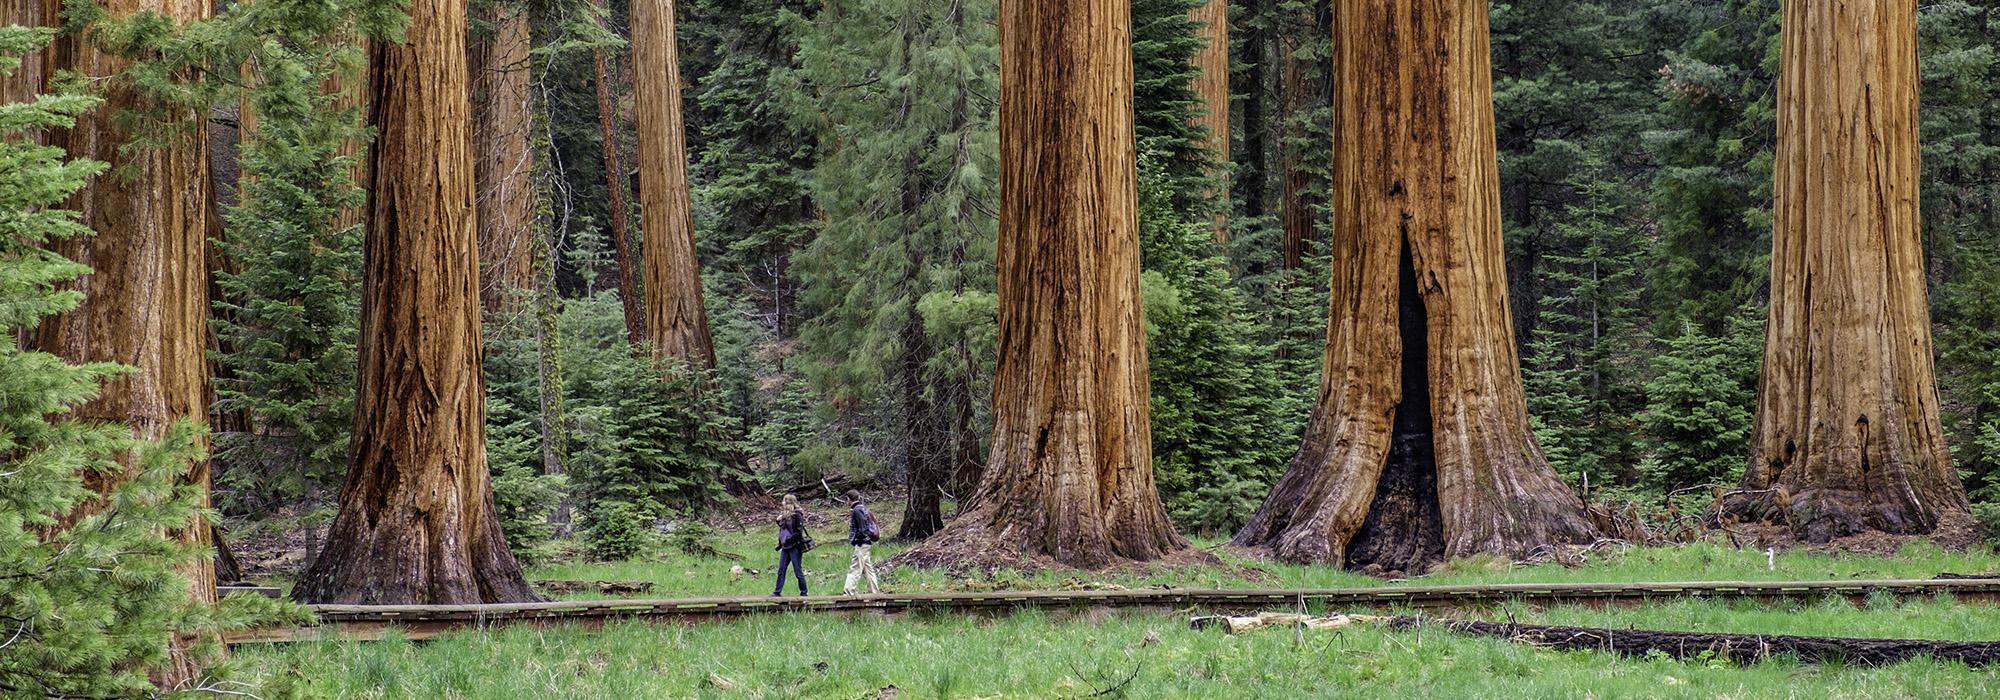 CA_SierraNevadaMountainRange_SequoiaNationalPark_byJonathanIrish-courtesySaveTheRedwoodsLeague-courtesyTCLF_2016_001_Hero.jpg